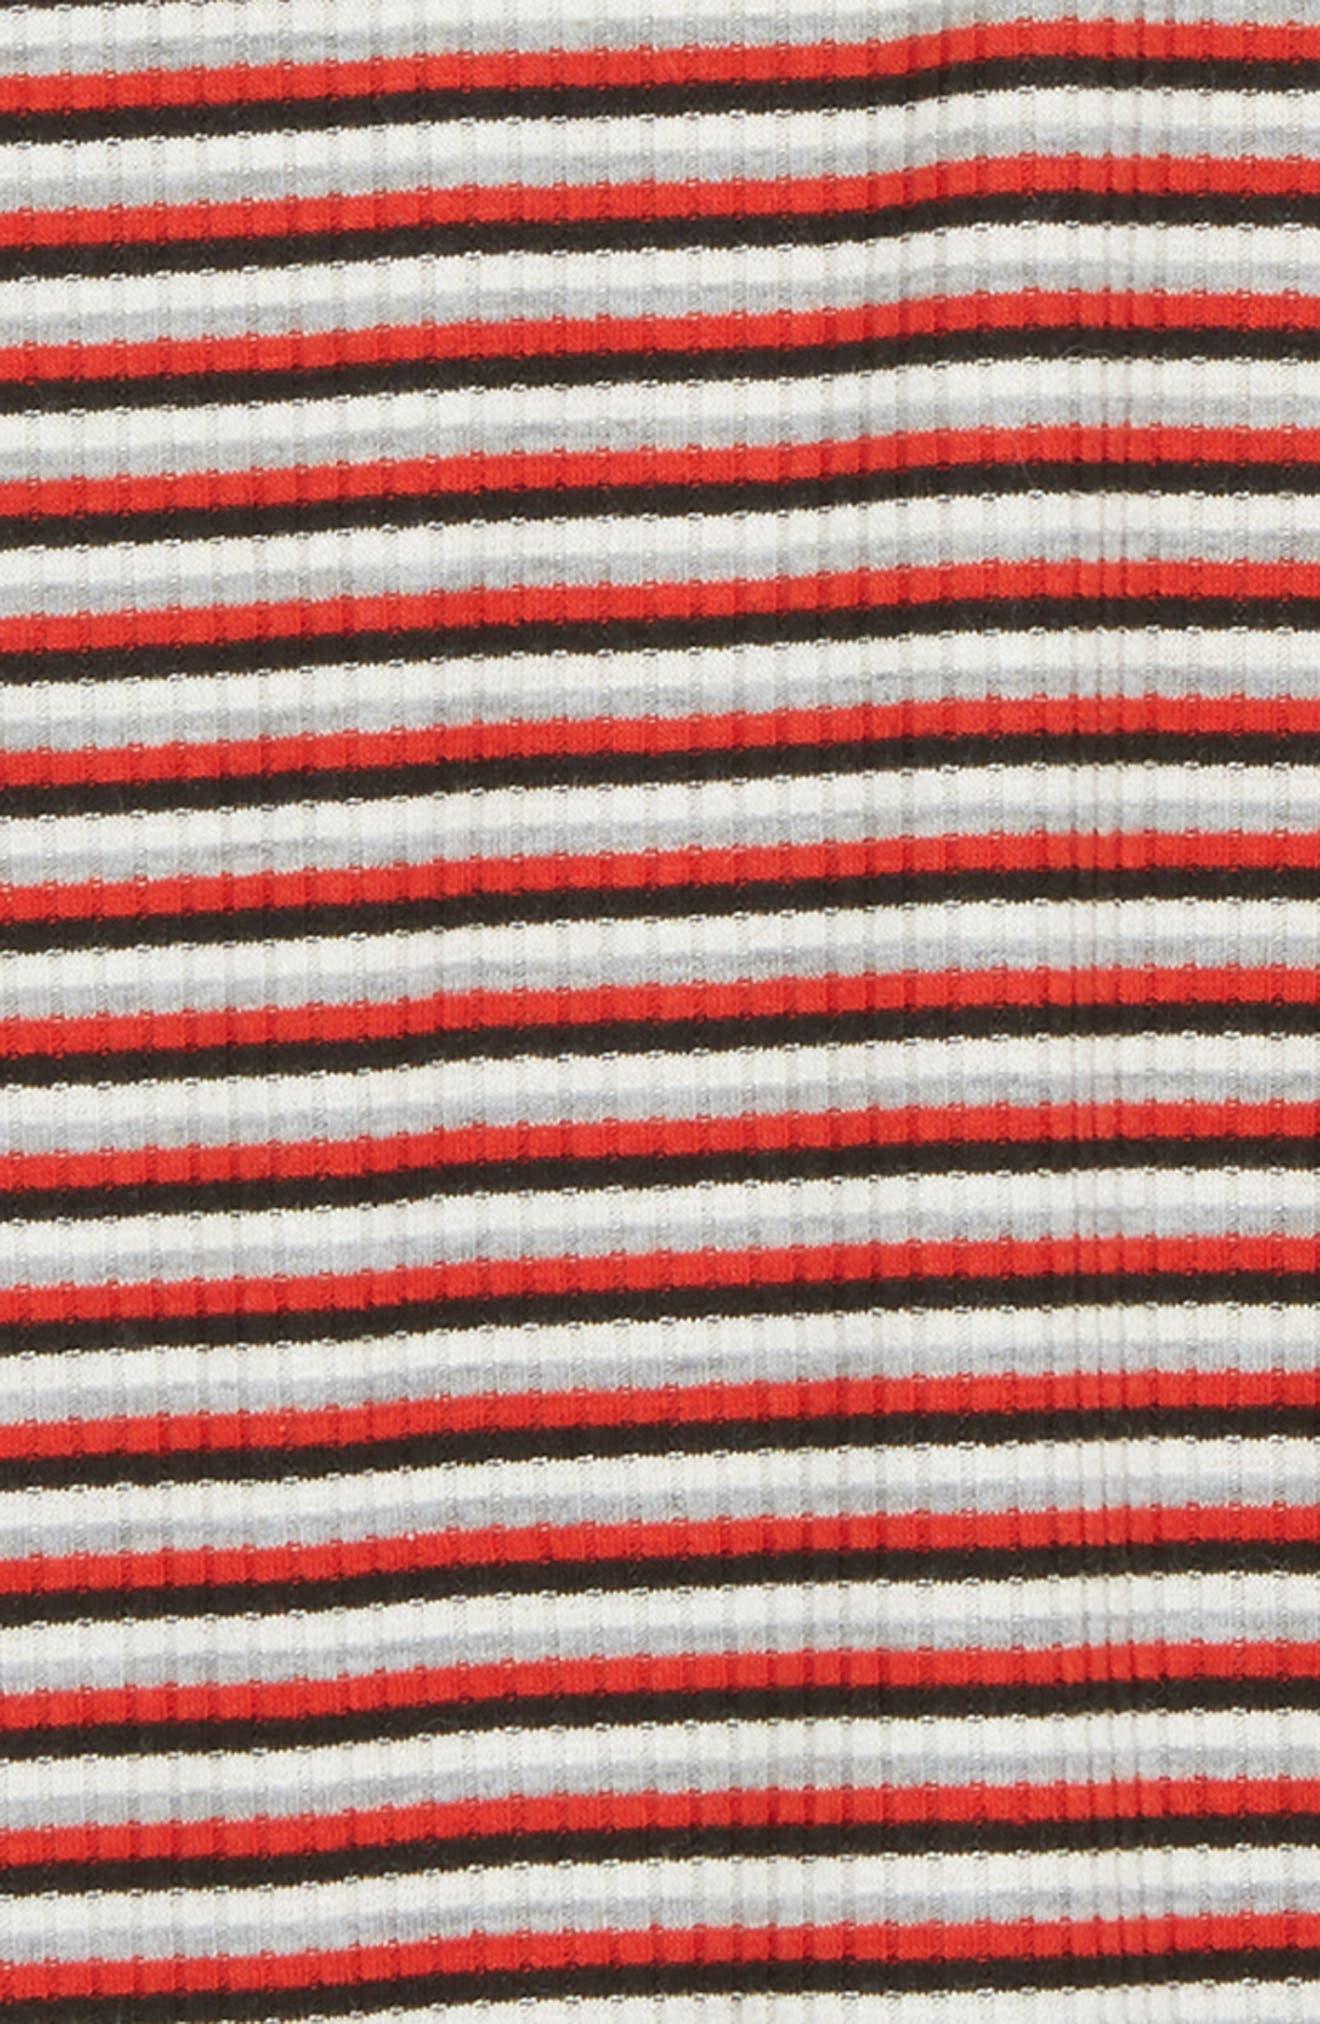 Asymmetrical Hem Tee,                             Alternate thumbnail 2, color,                             RED MULTI